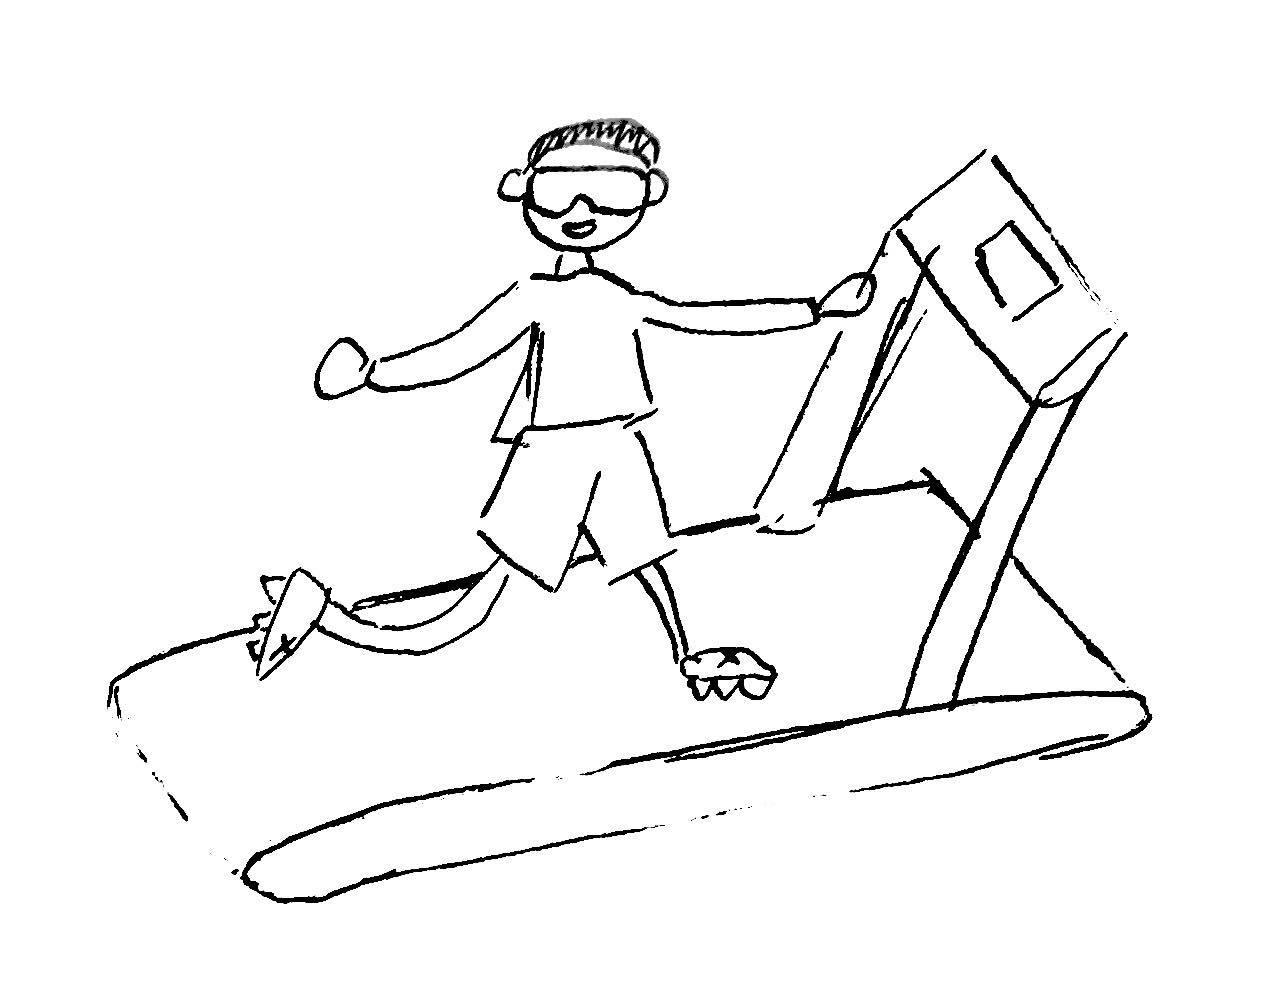 Persona Sketch IV